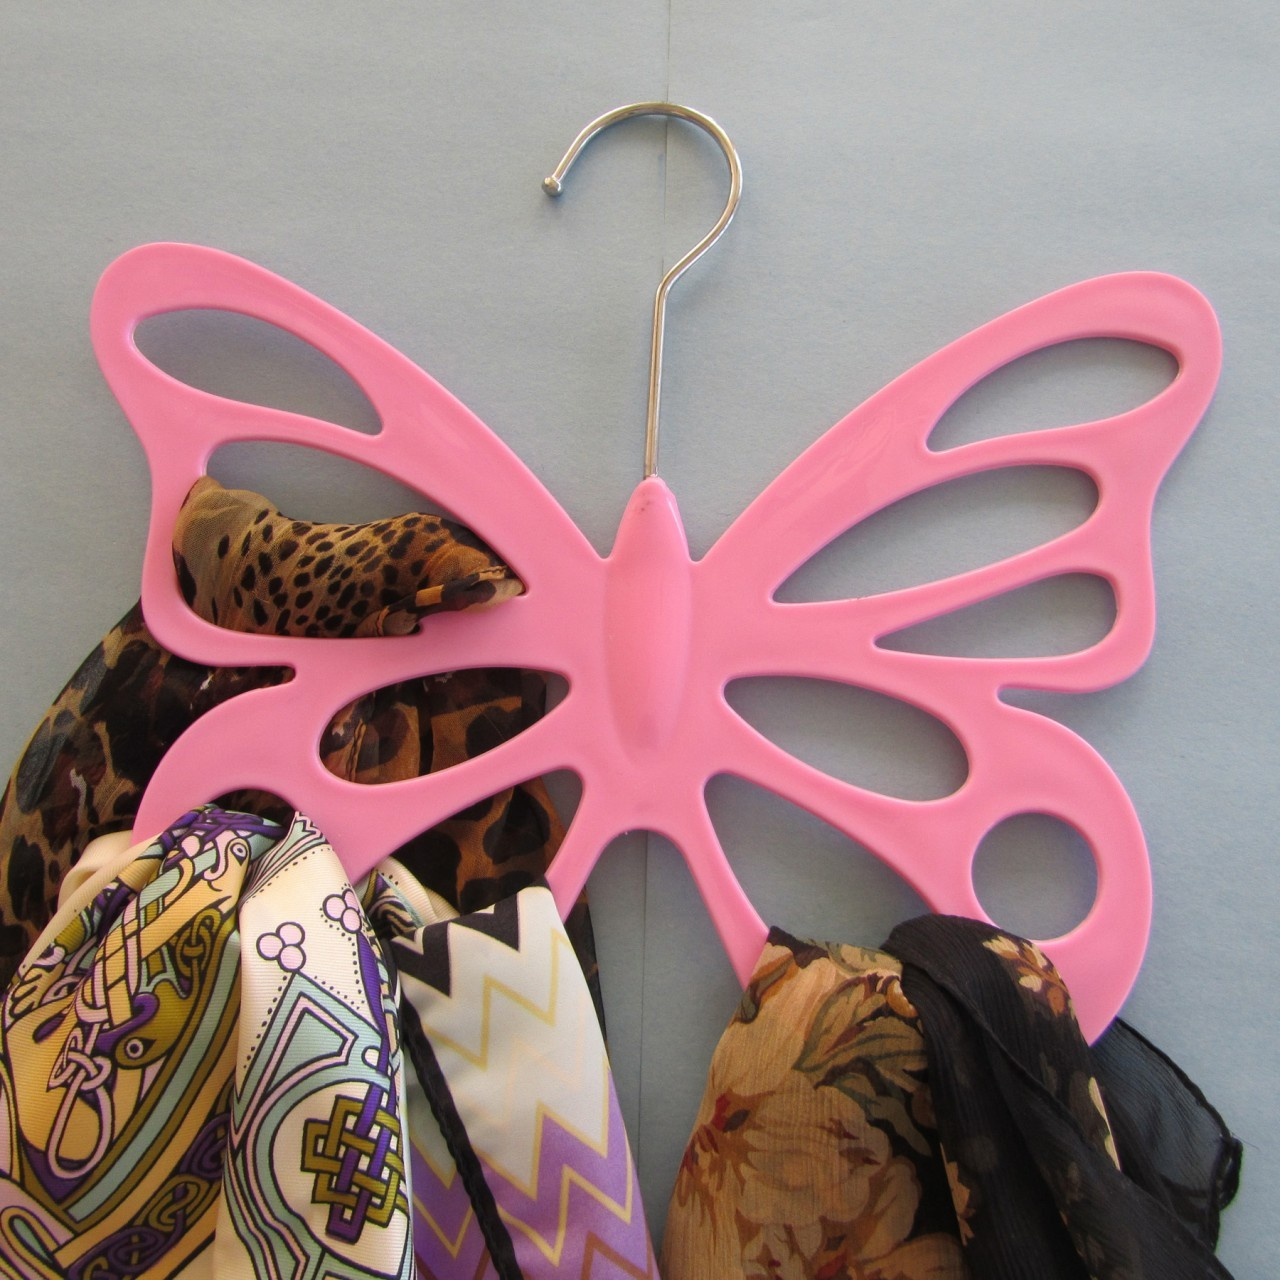 PinkButterfly_Hanger__66501.1332821025.1280.1280